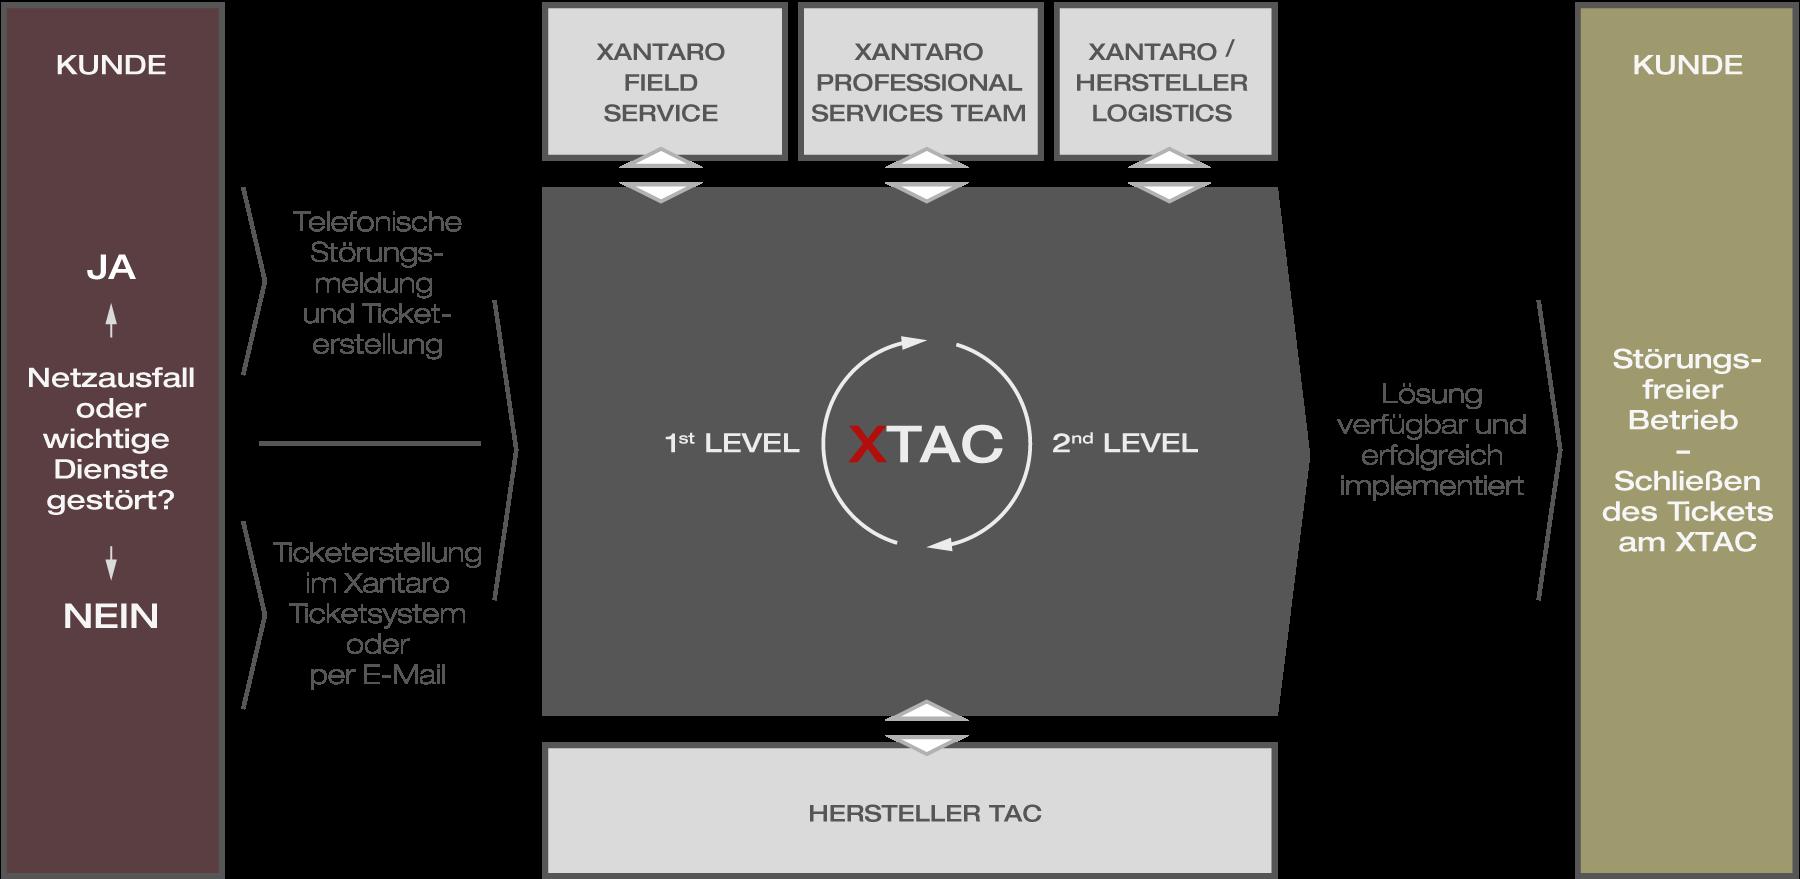 Xantaro XTAC Workflow